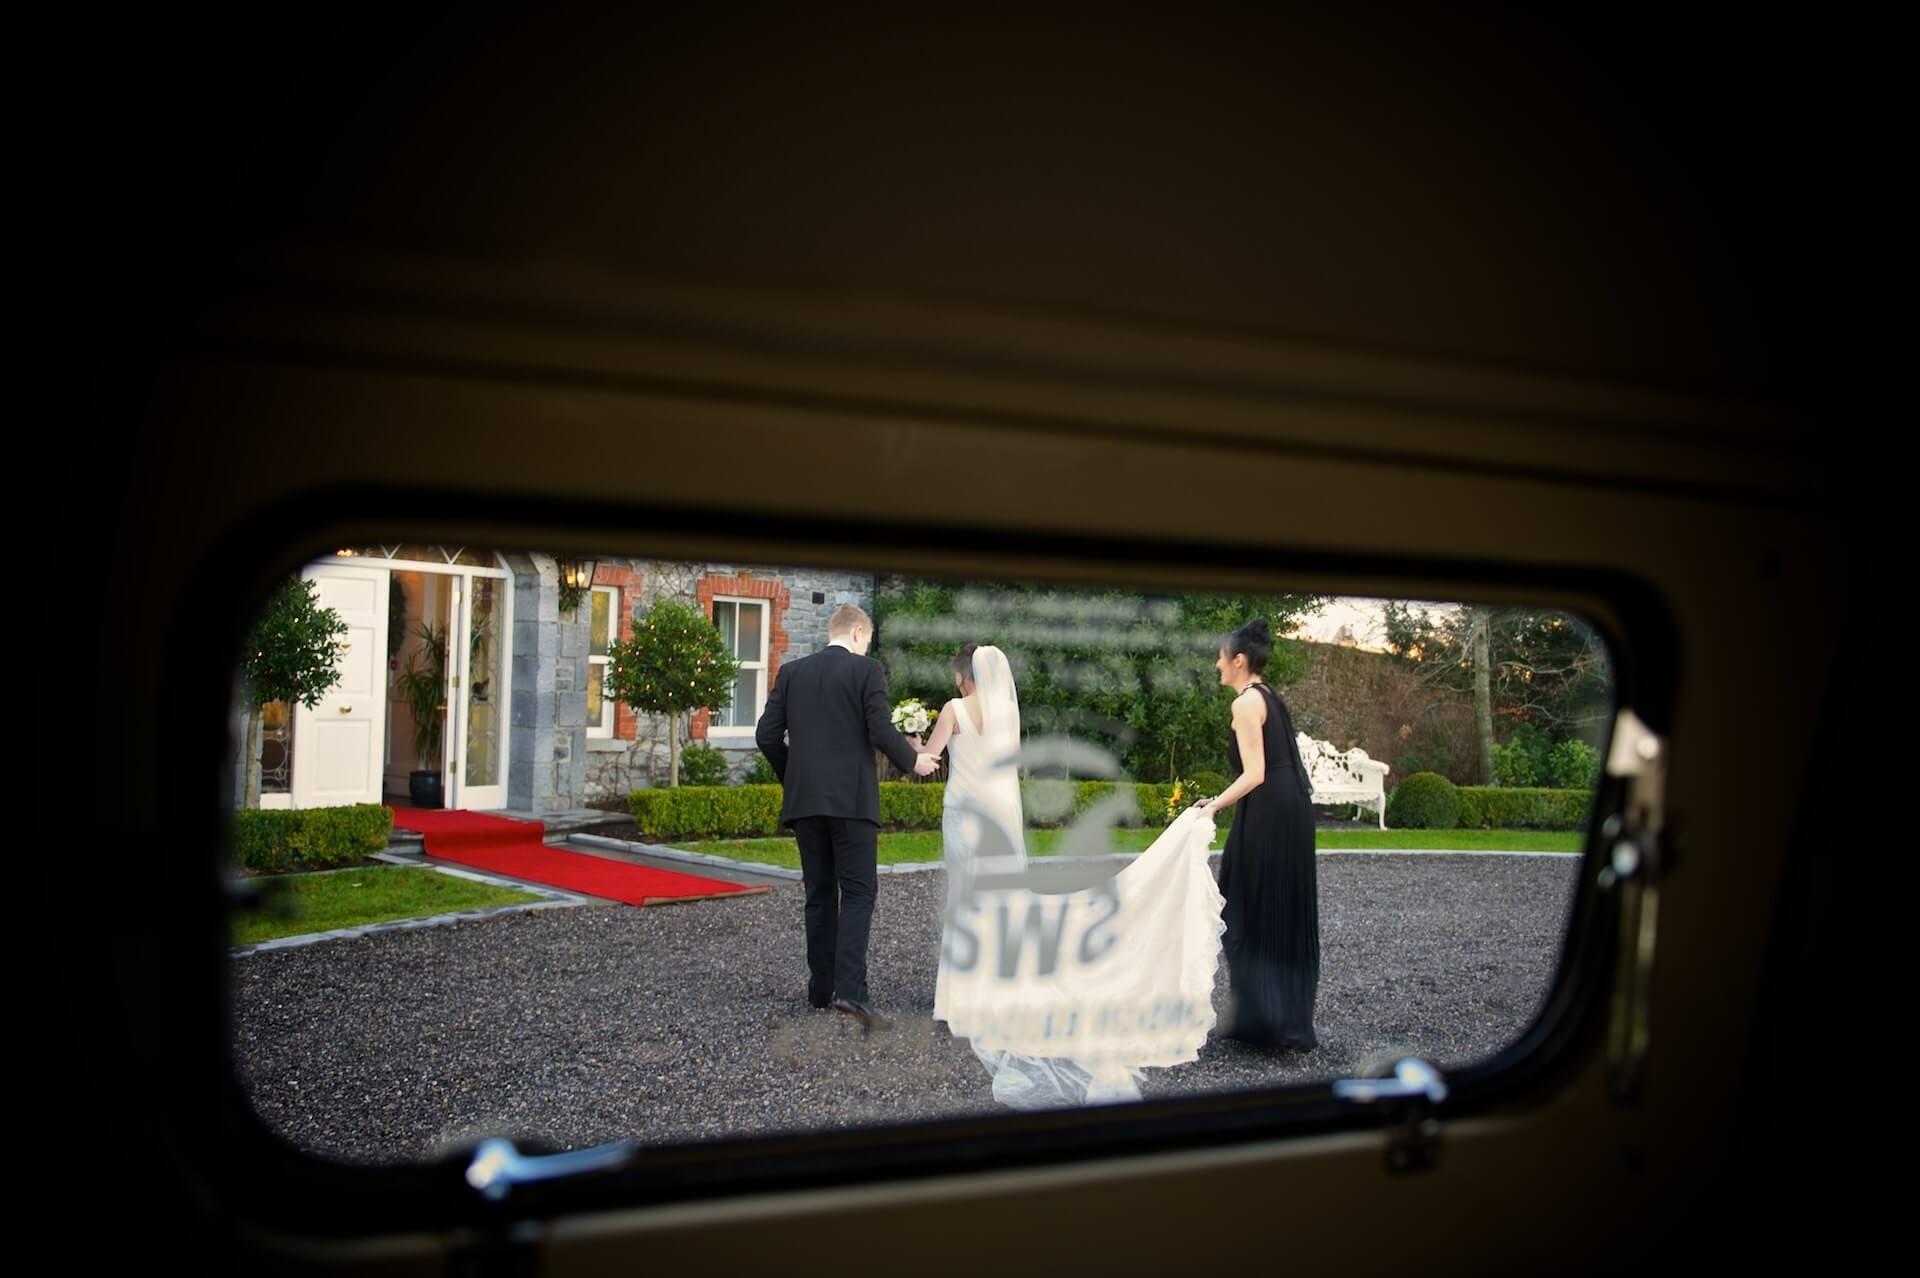 022 Wedding Meath Ballymagarvey Village Bride Groom Arrive